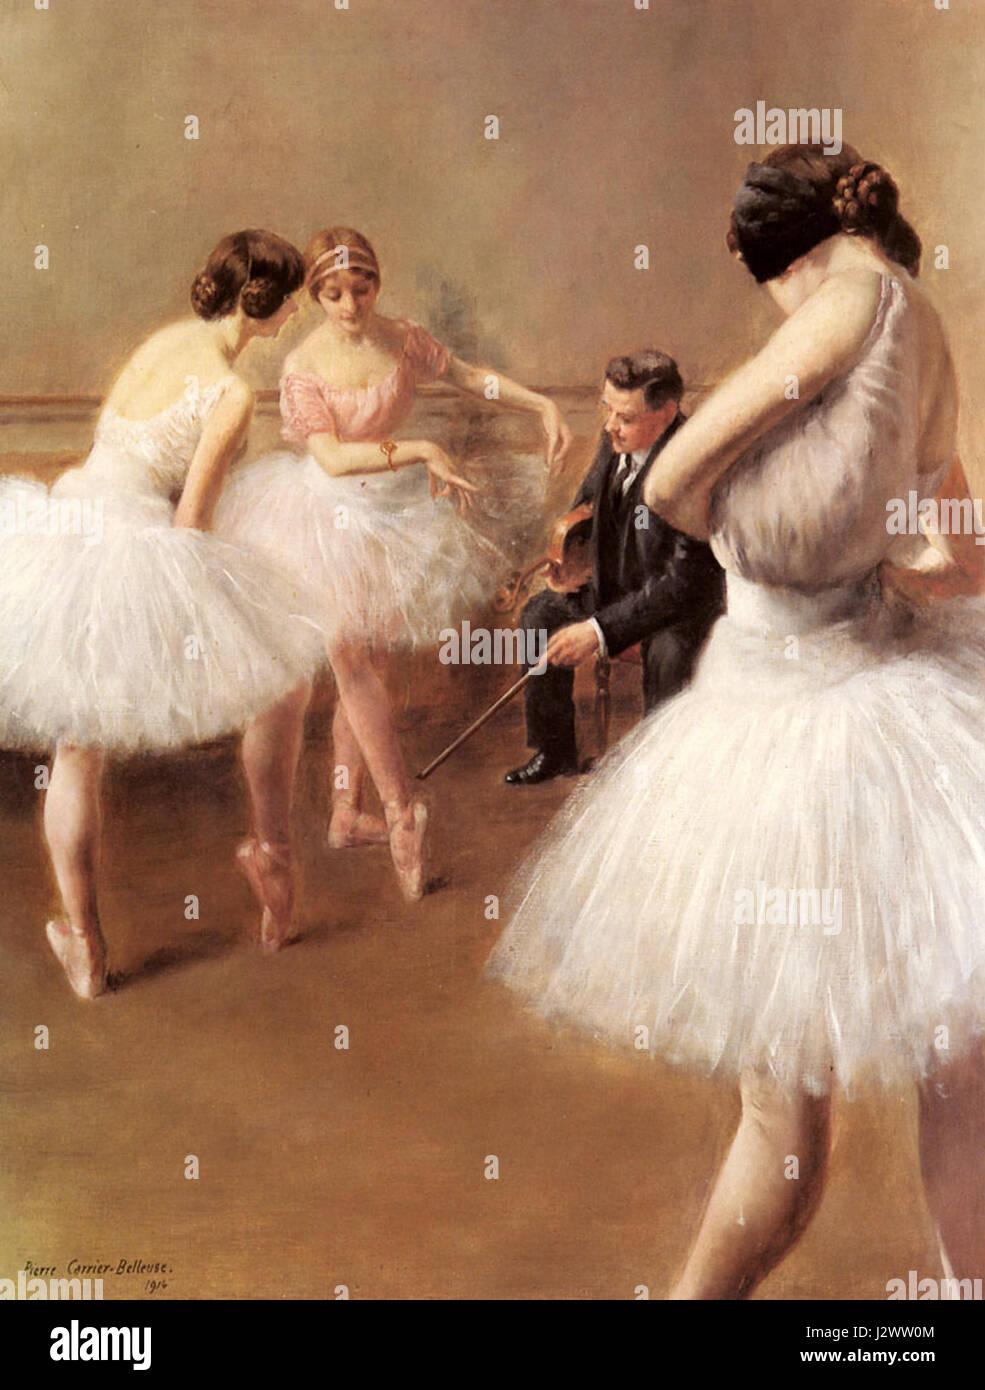 Carrier Belleuse Pierre The Ballet Lesson Stock Photo